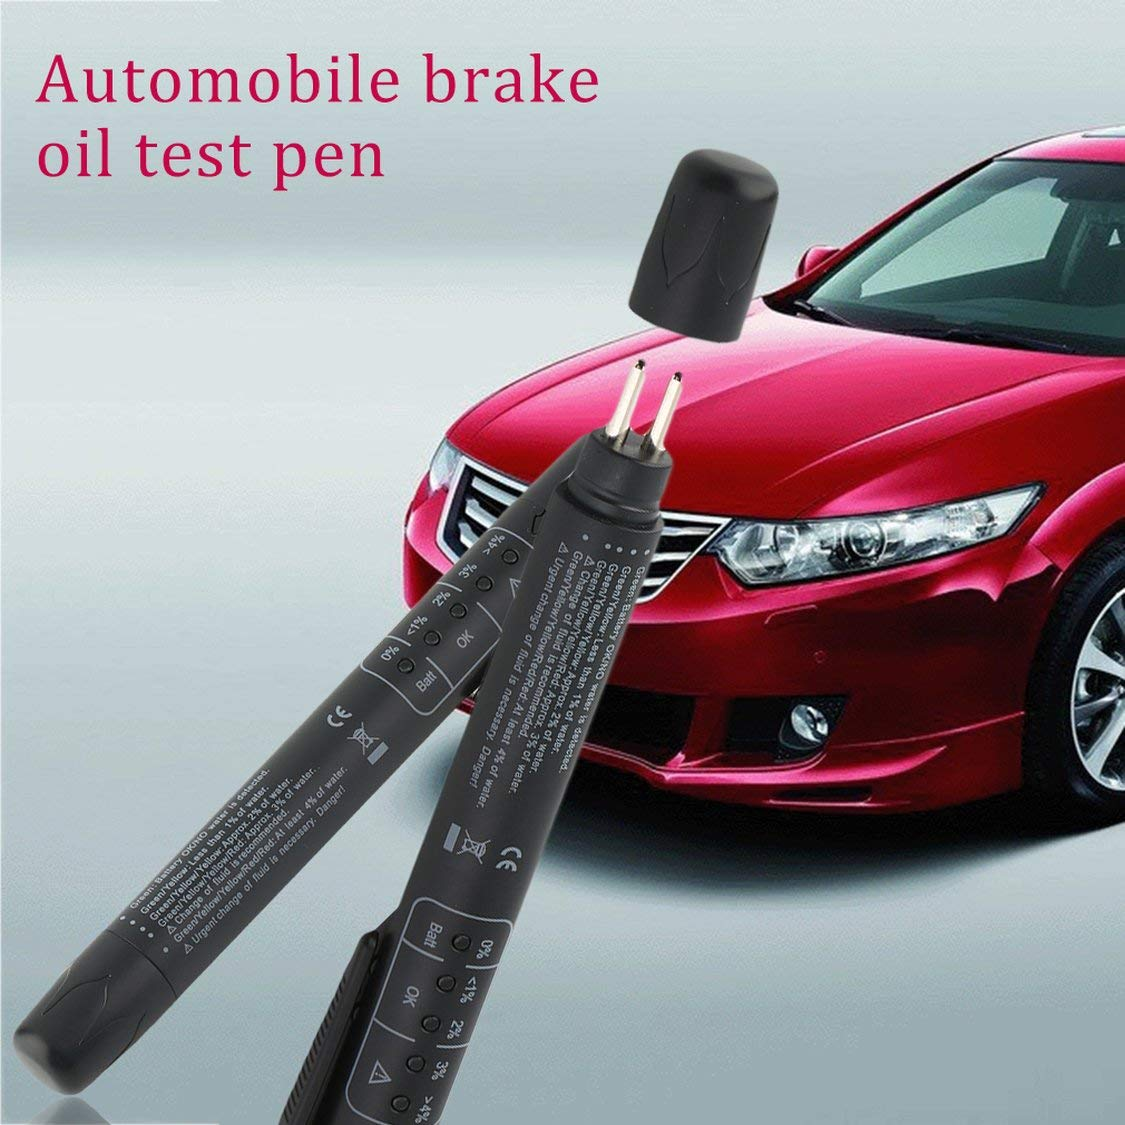 Universal Car Tester Pen Auto Vehicle 5 LEDs Brake Fluid Brake Oil Tester Moisture Oil Testing Tool Vehicle Diagnostic Tools